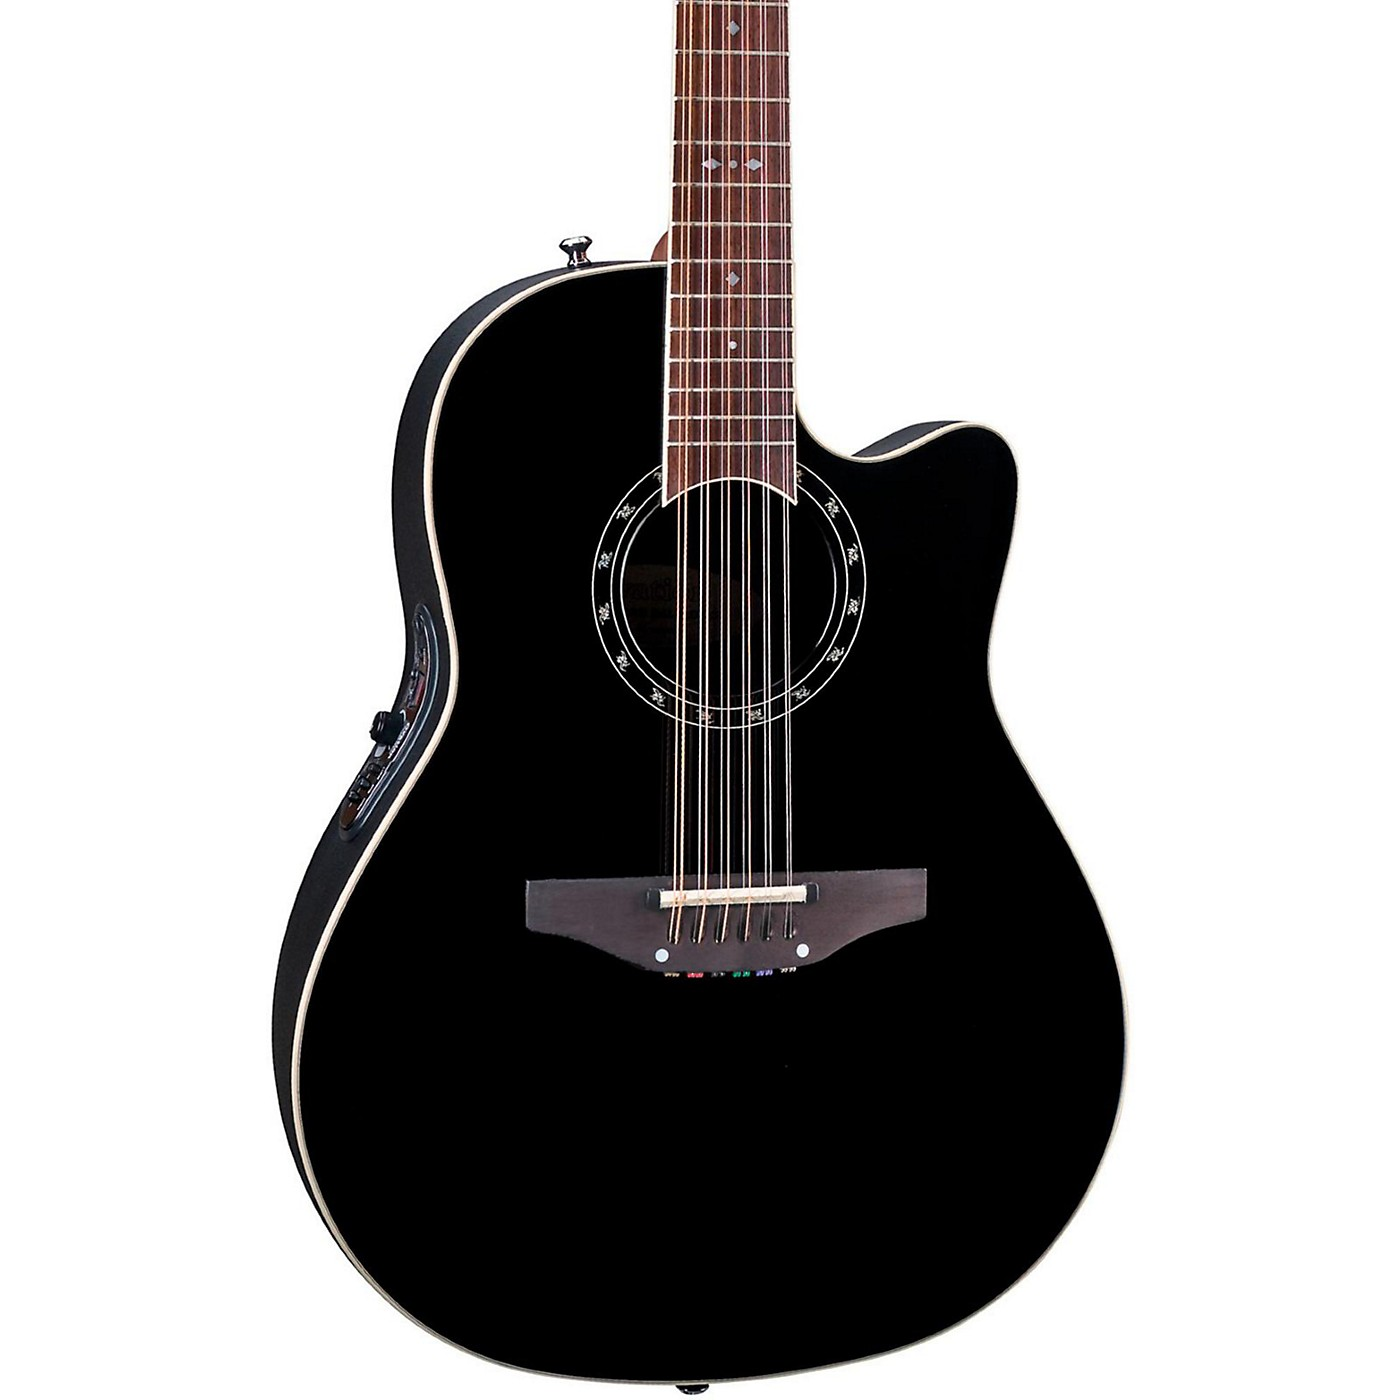 Ovation Standard Balladeer 2751 AX 12-String Acoustic-Electric Guitar thumbnail